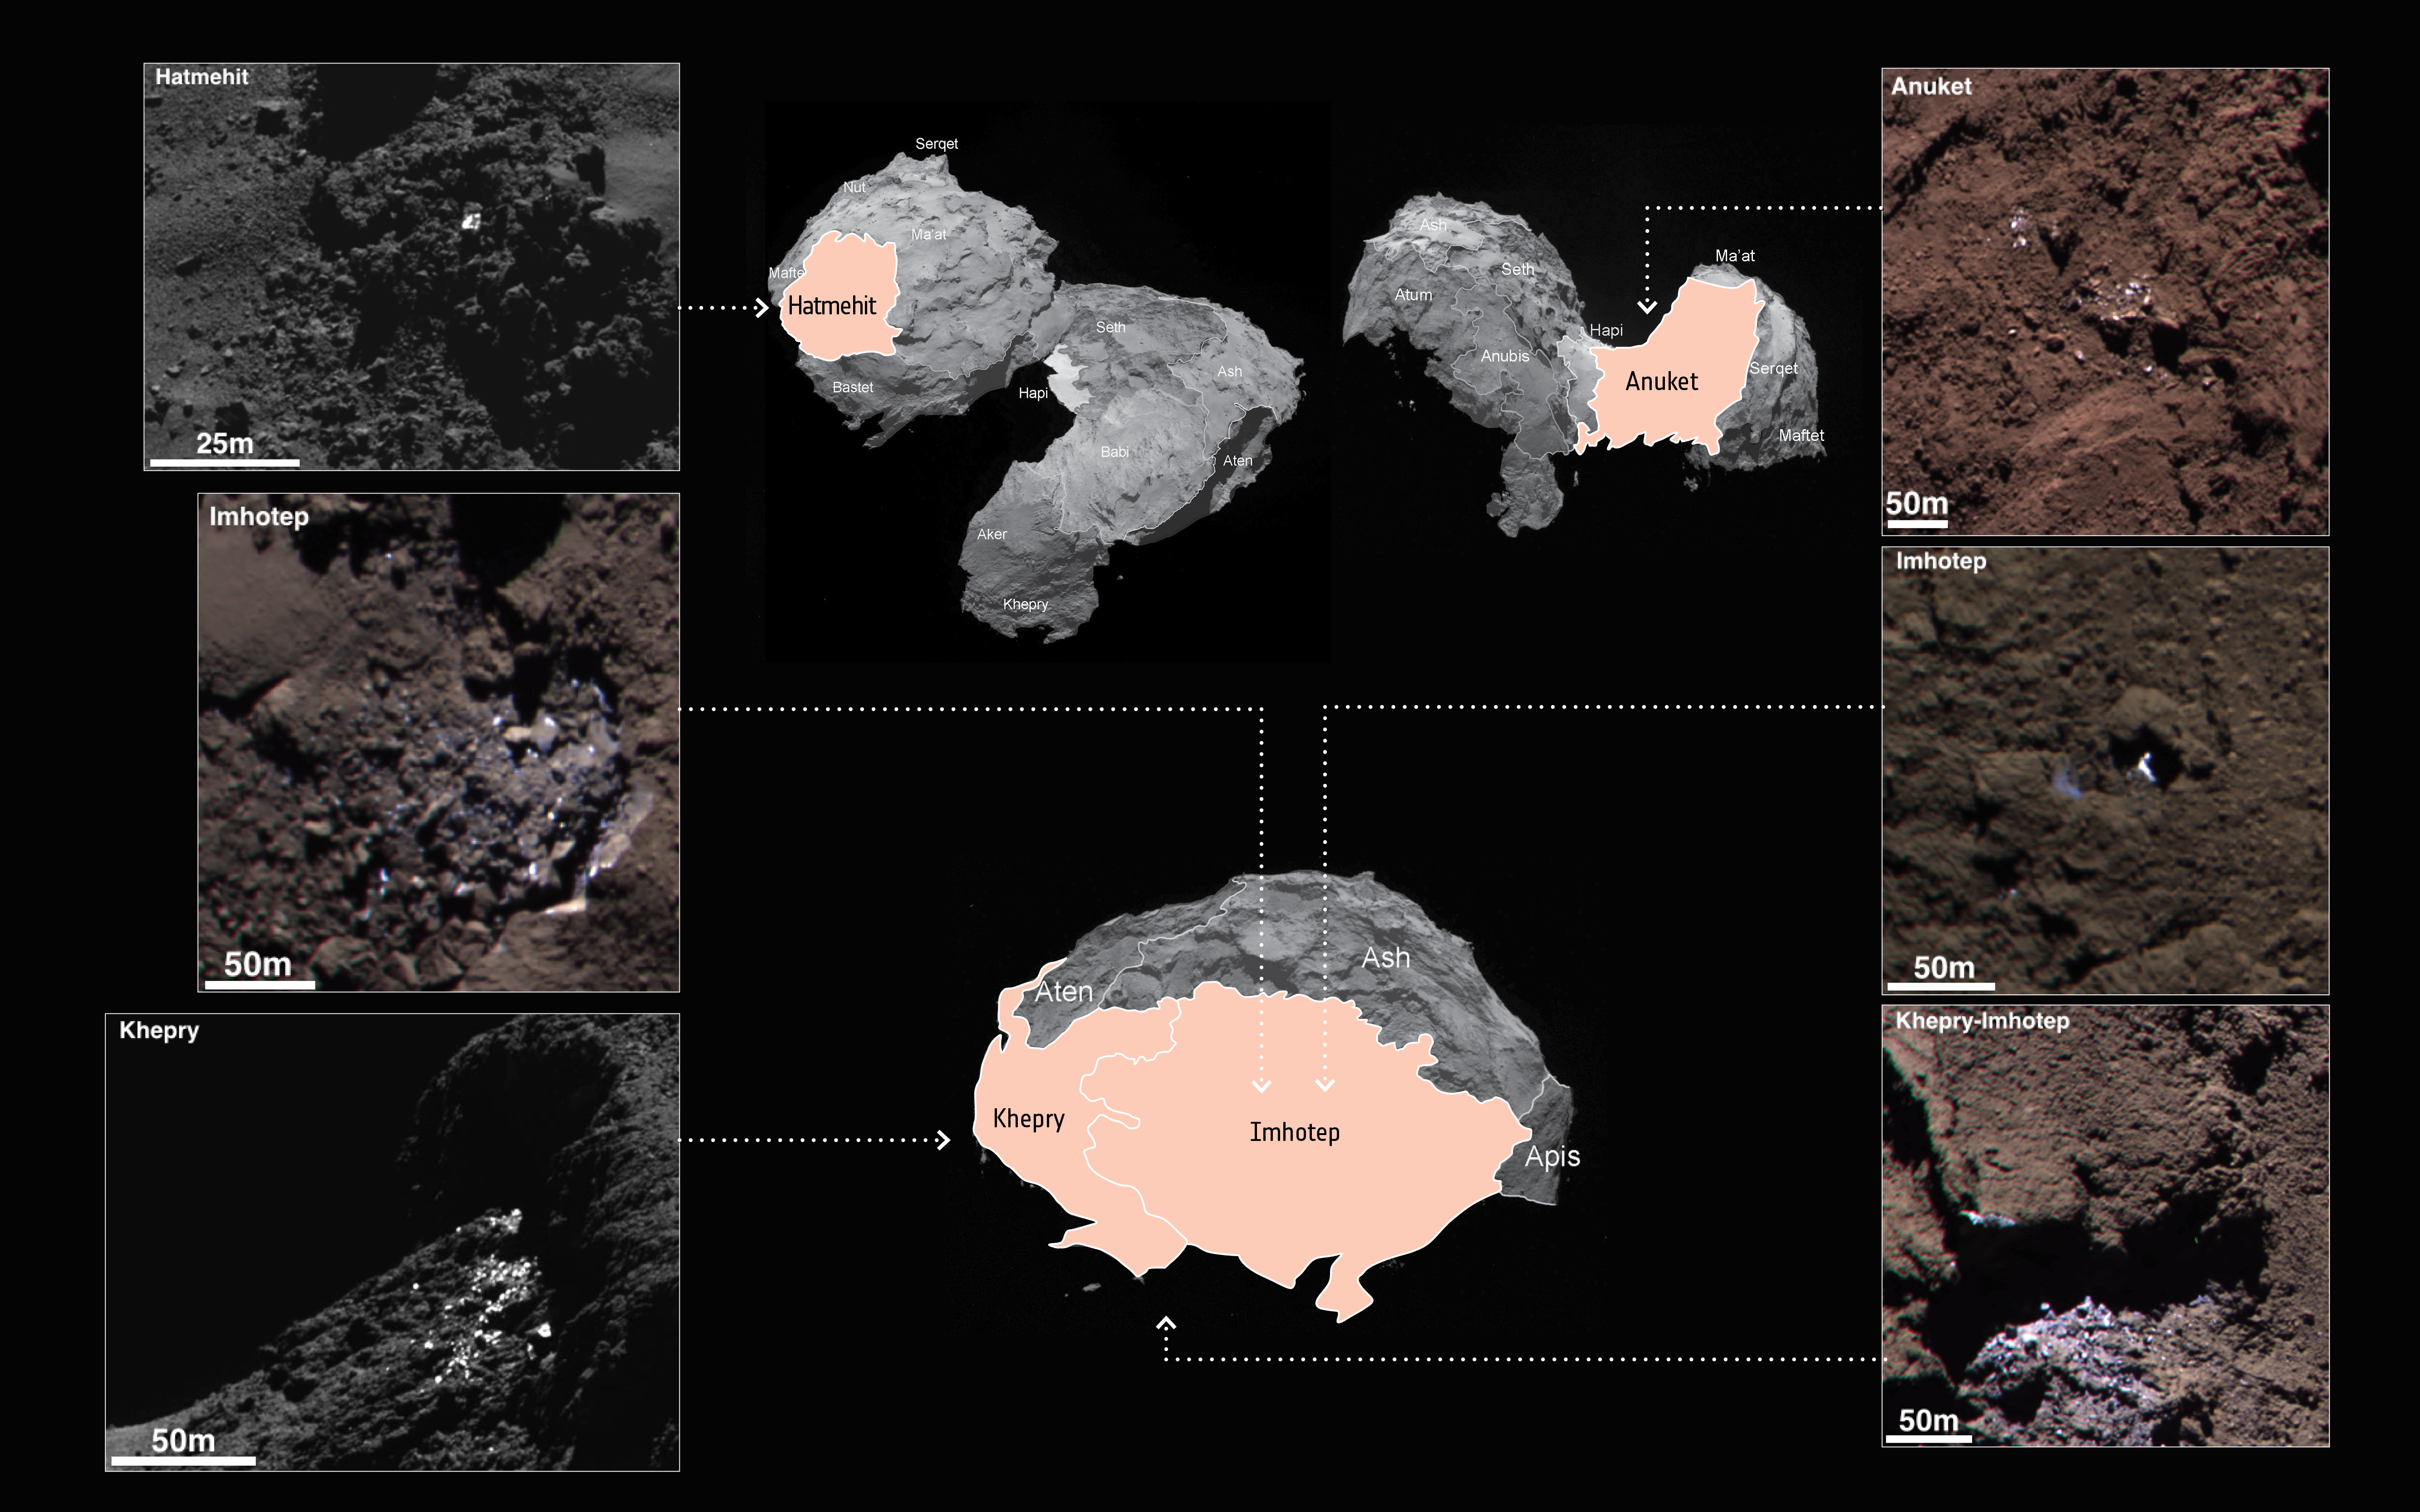 1567216163127-ESA_Rosetta_OSIRIS_67P_bright_features_context.jpg